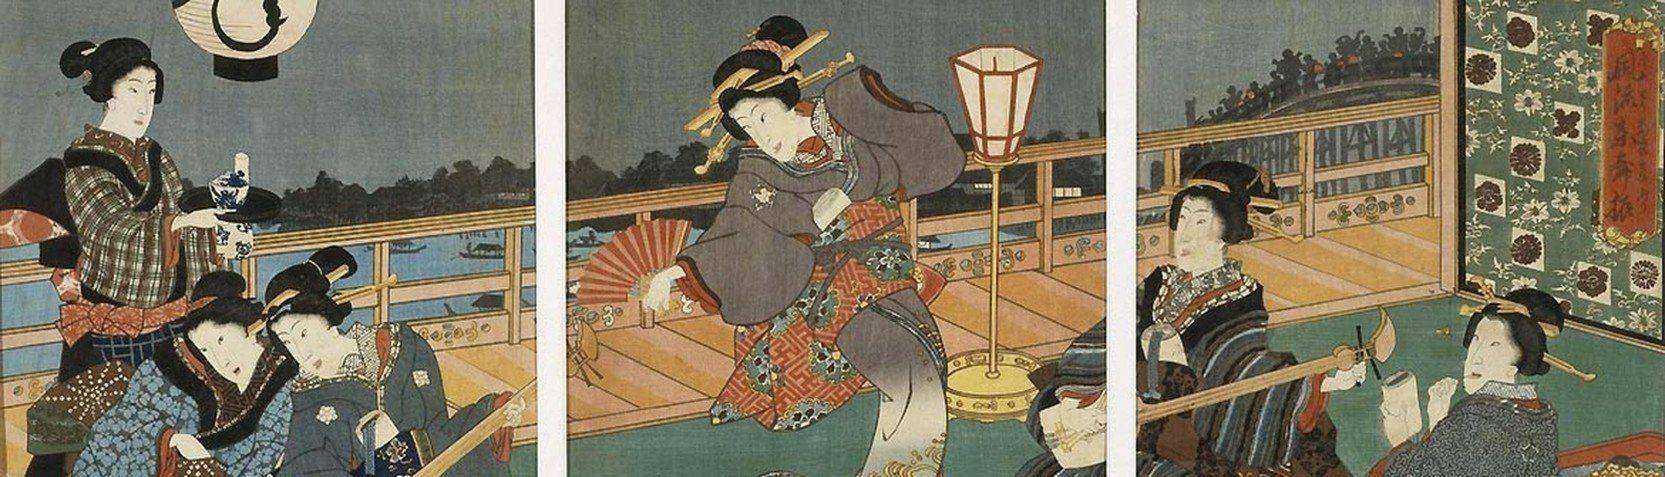 Artistas - Utagawa Kunisada